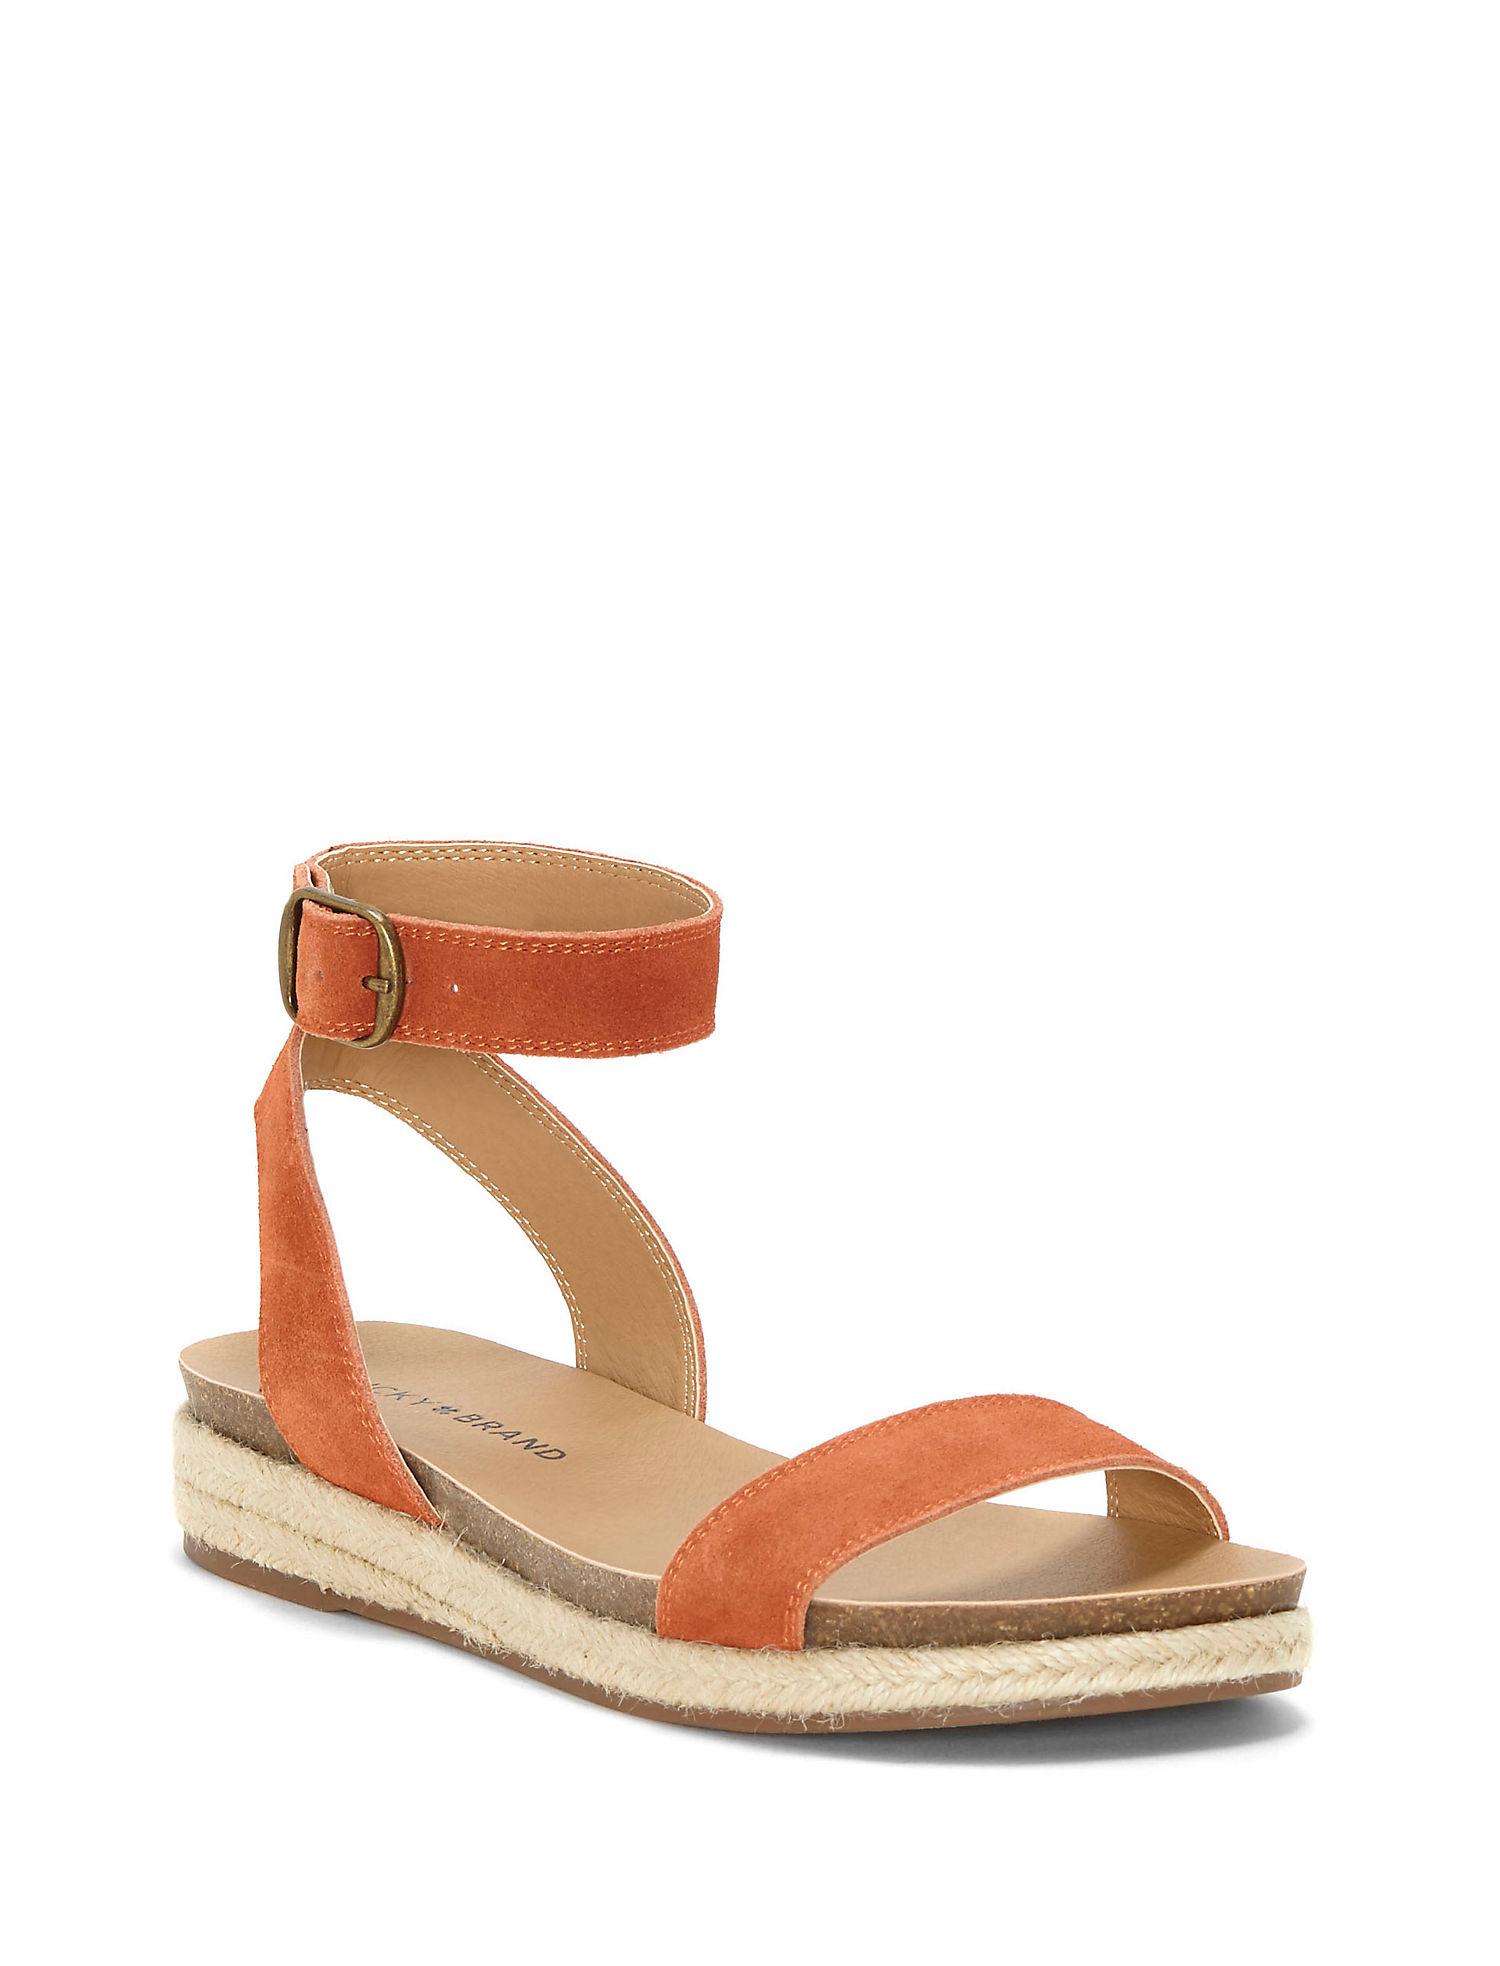 Lucky Brand Women's Garston An... discount sneakernews discount buy xWtQfuIAB